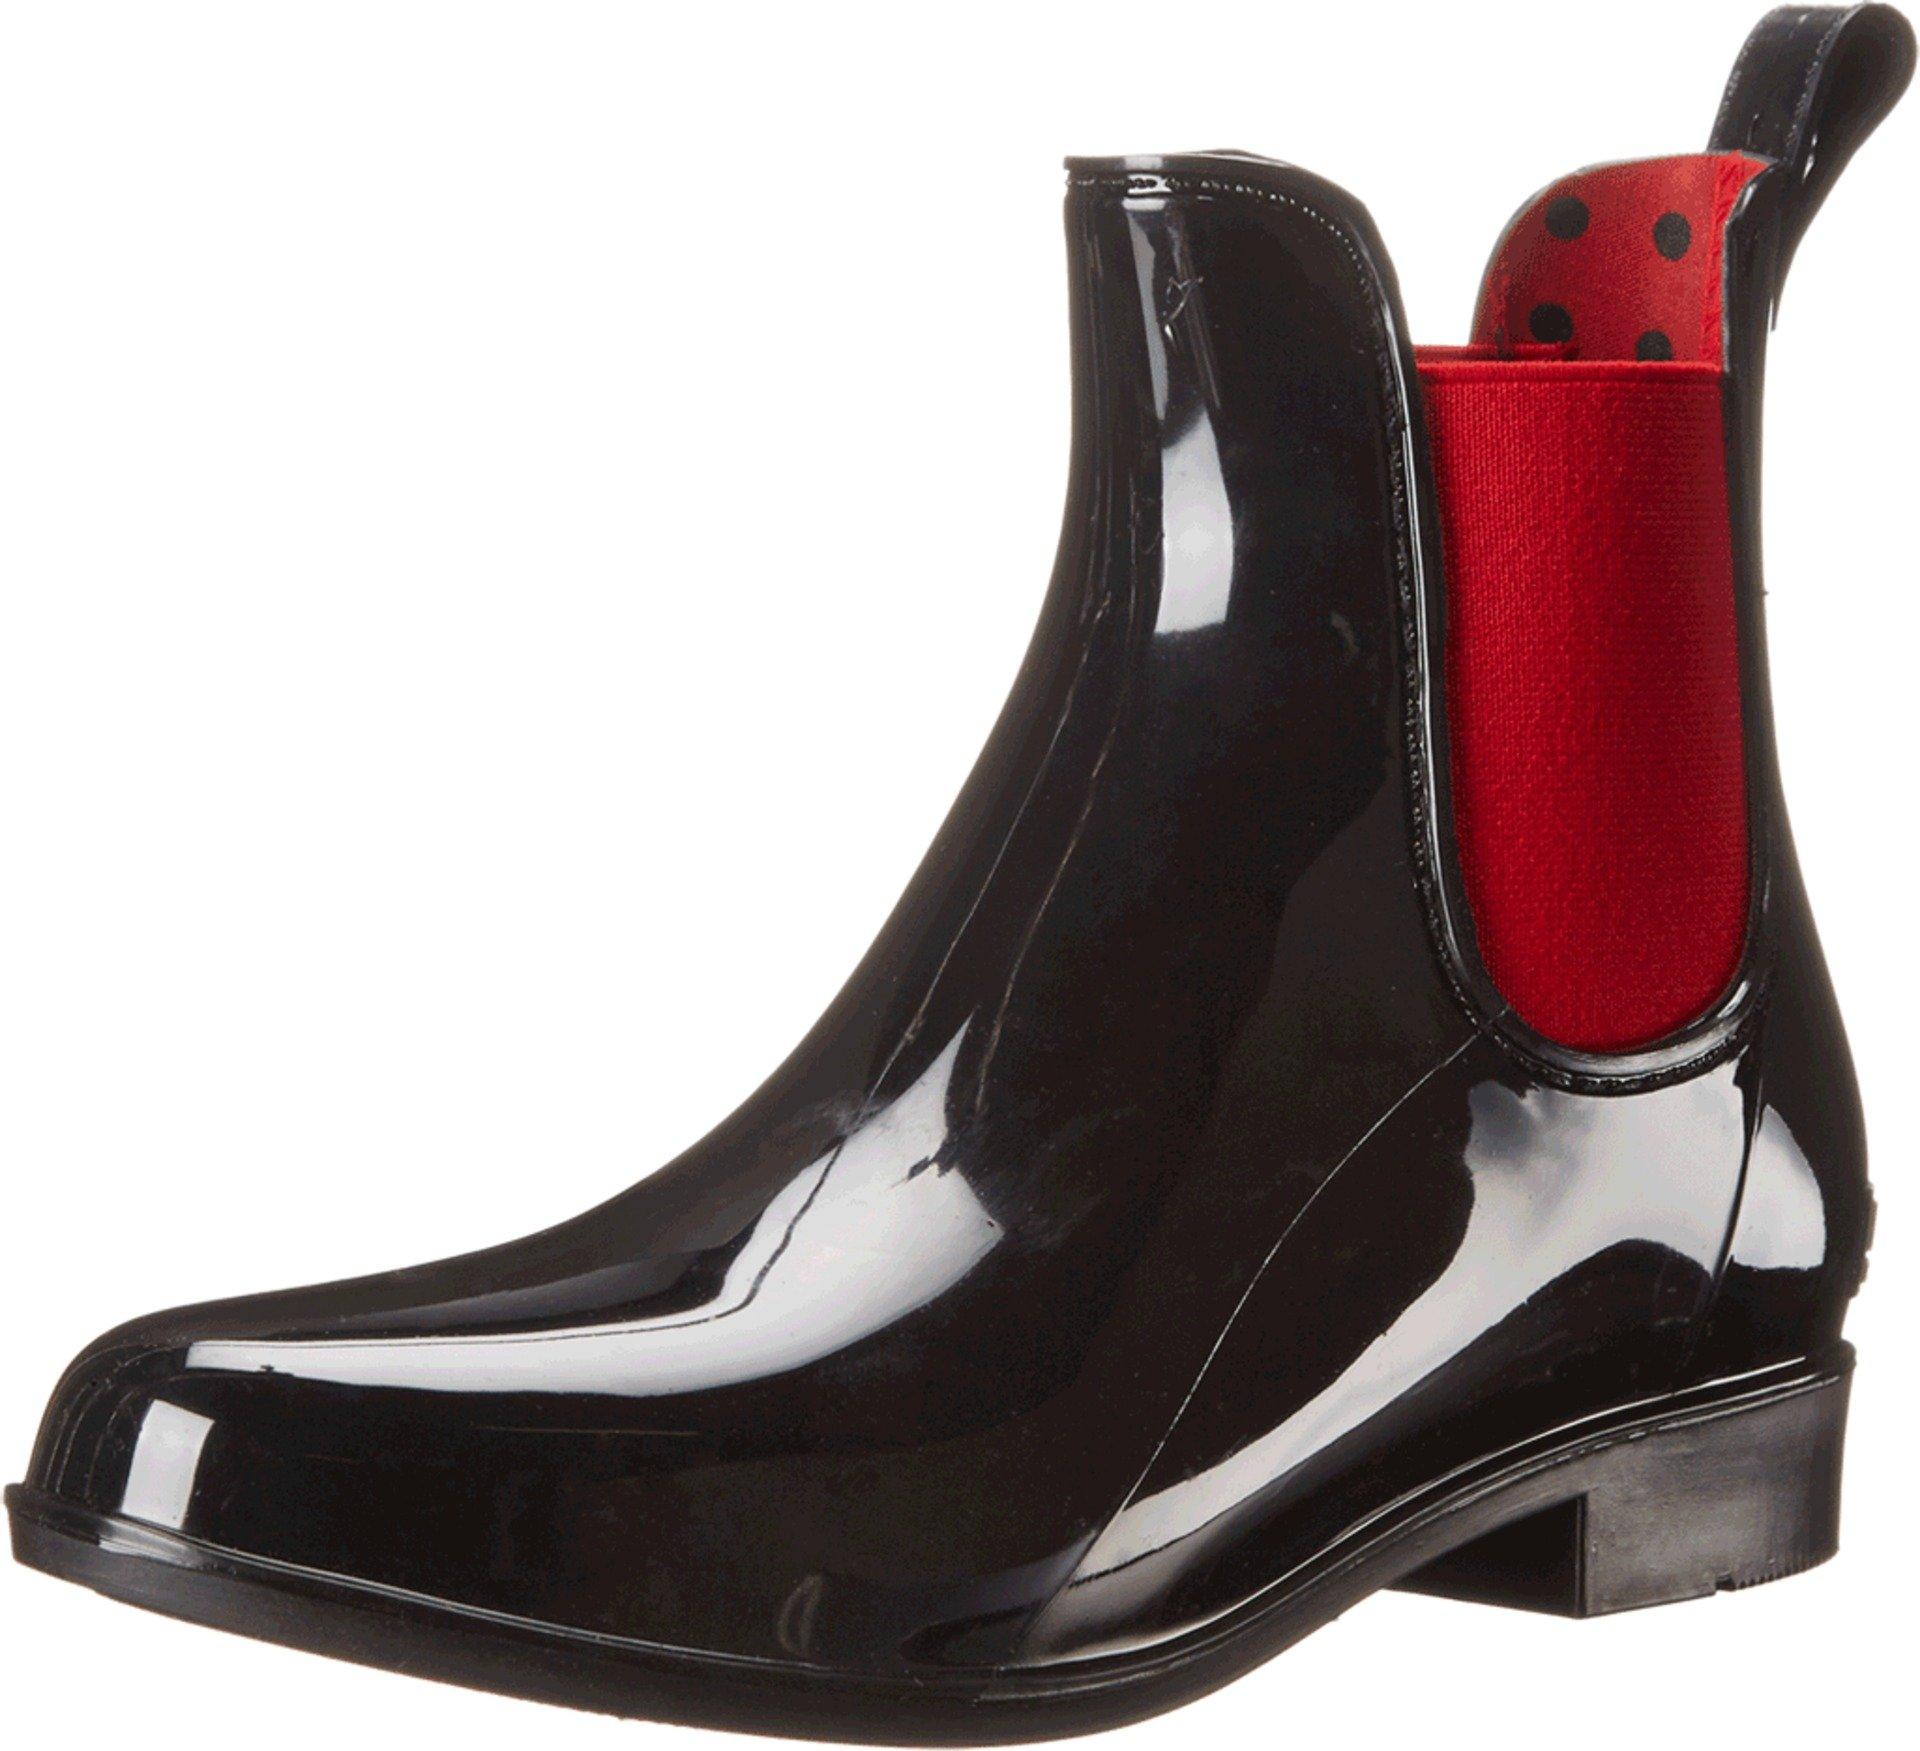 Lauren Ralph Lauren Women's Tally Rain Shoe, Black/Real Bright Red Solid Polyvinyl Chloride/Elastic, 7 B US